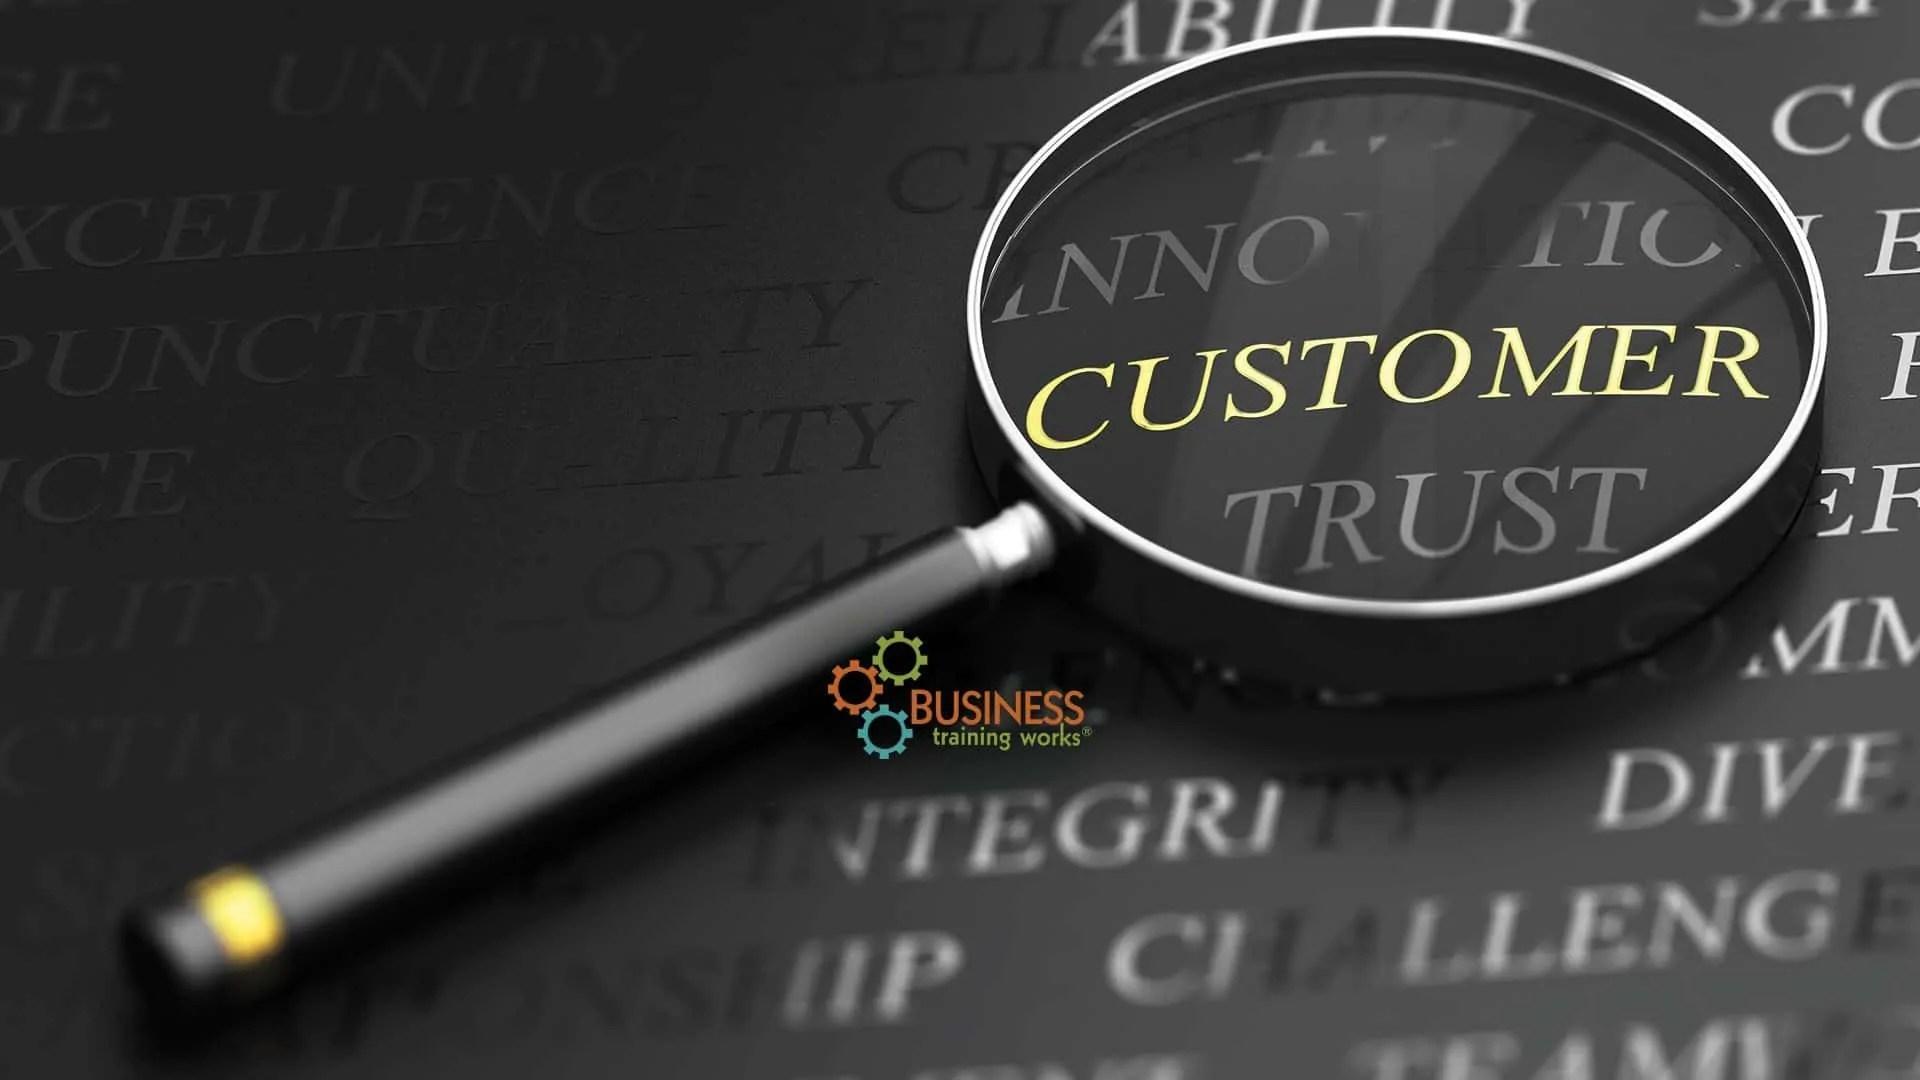 Web-Based Customer Service Course